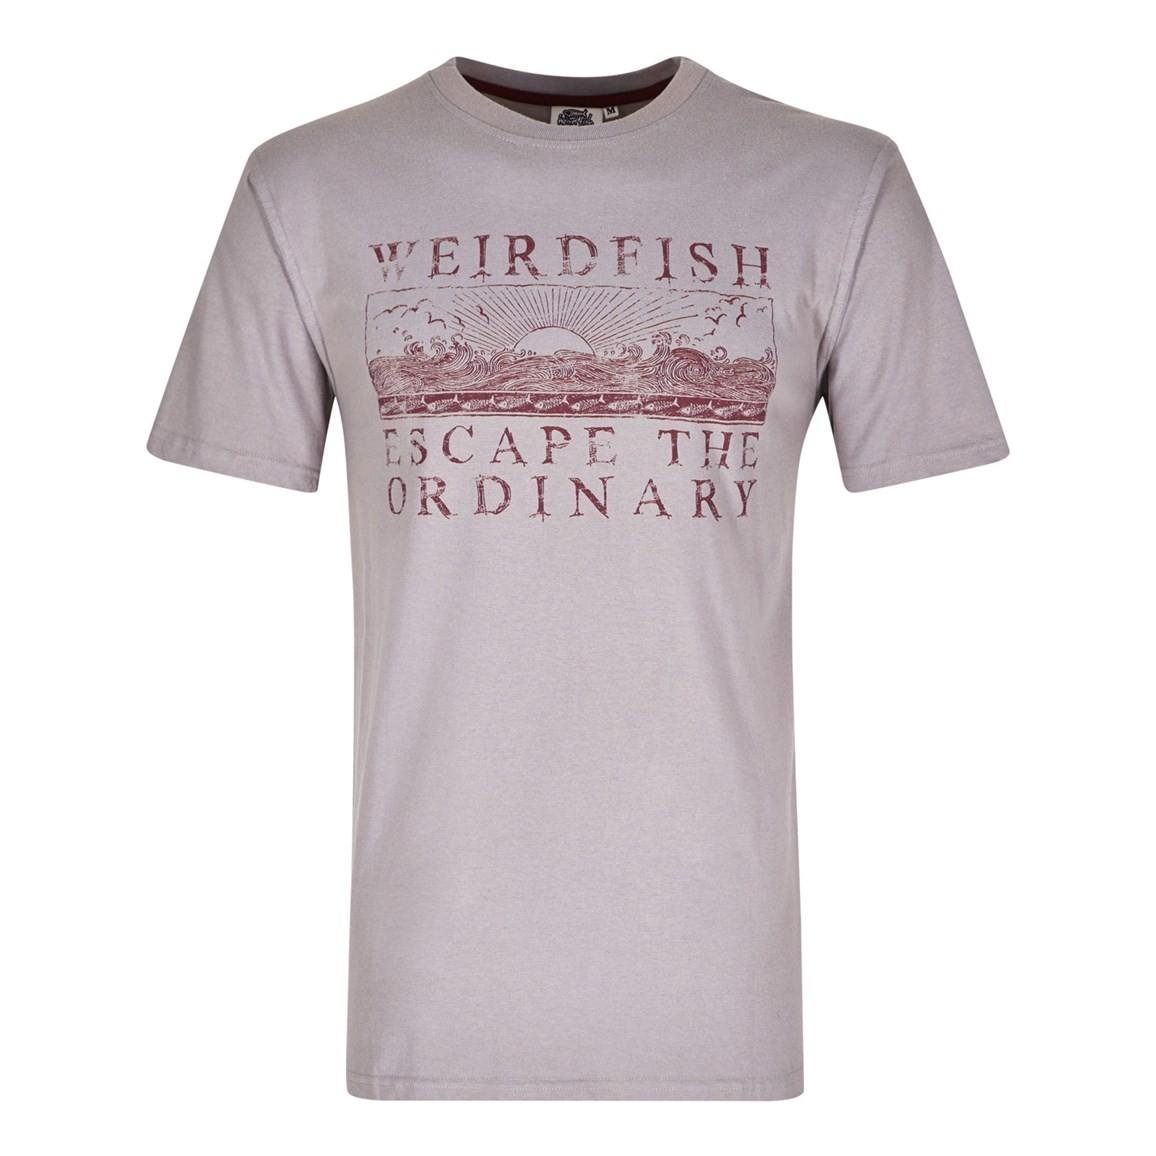 Weird Fish Raziel Branded Graphic Print T-Shirt Frost Grey Size 2XL